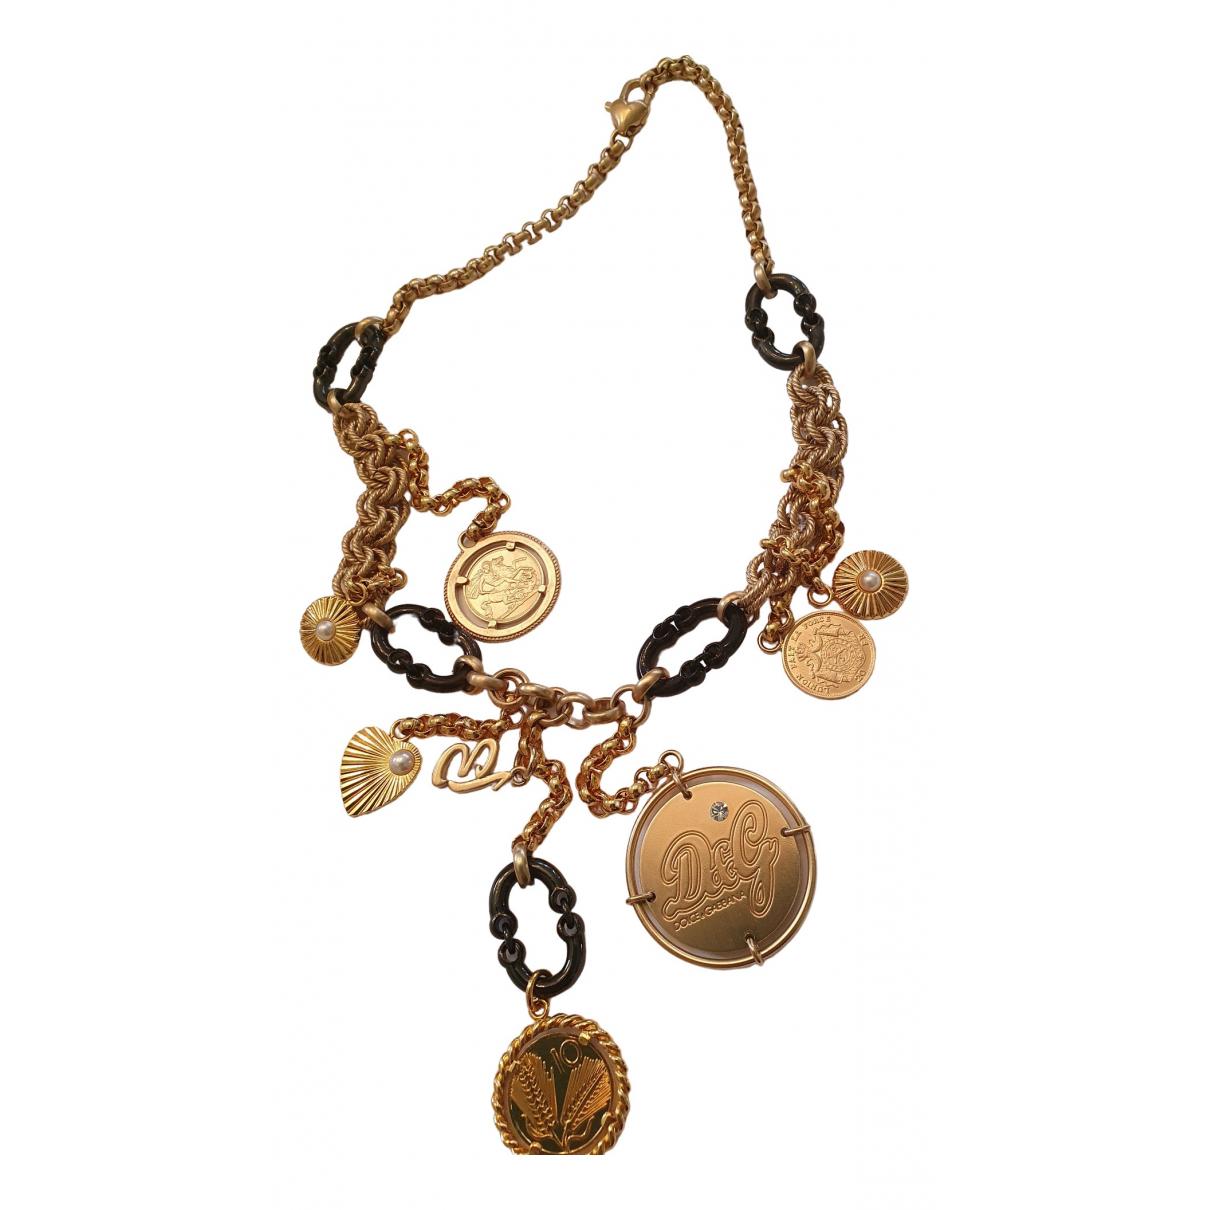 D&g \N Halskette in  Gold Metall